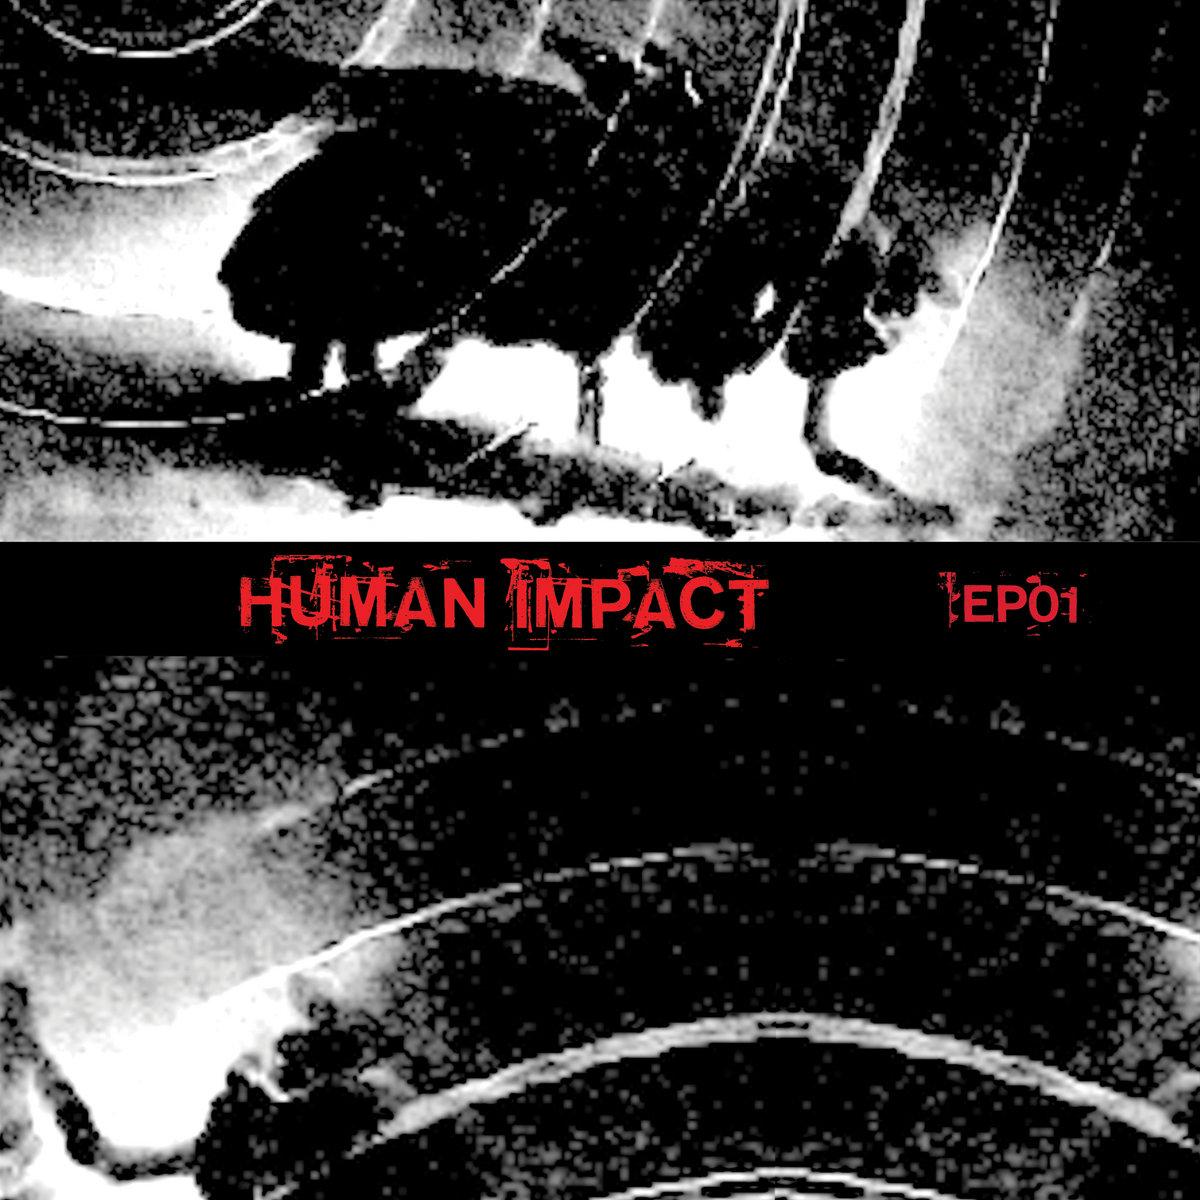 human impact ep01